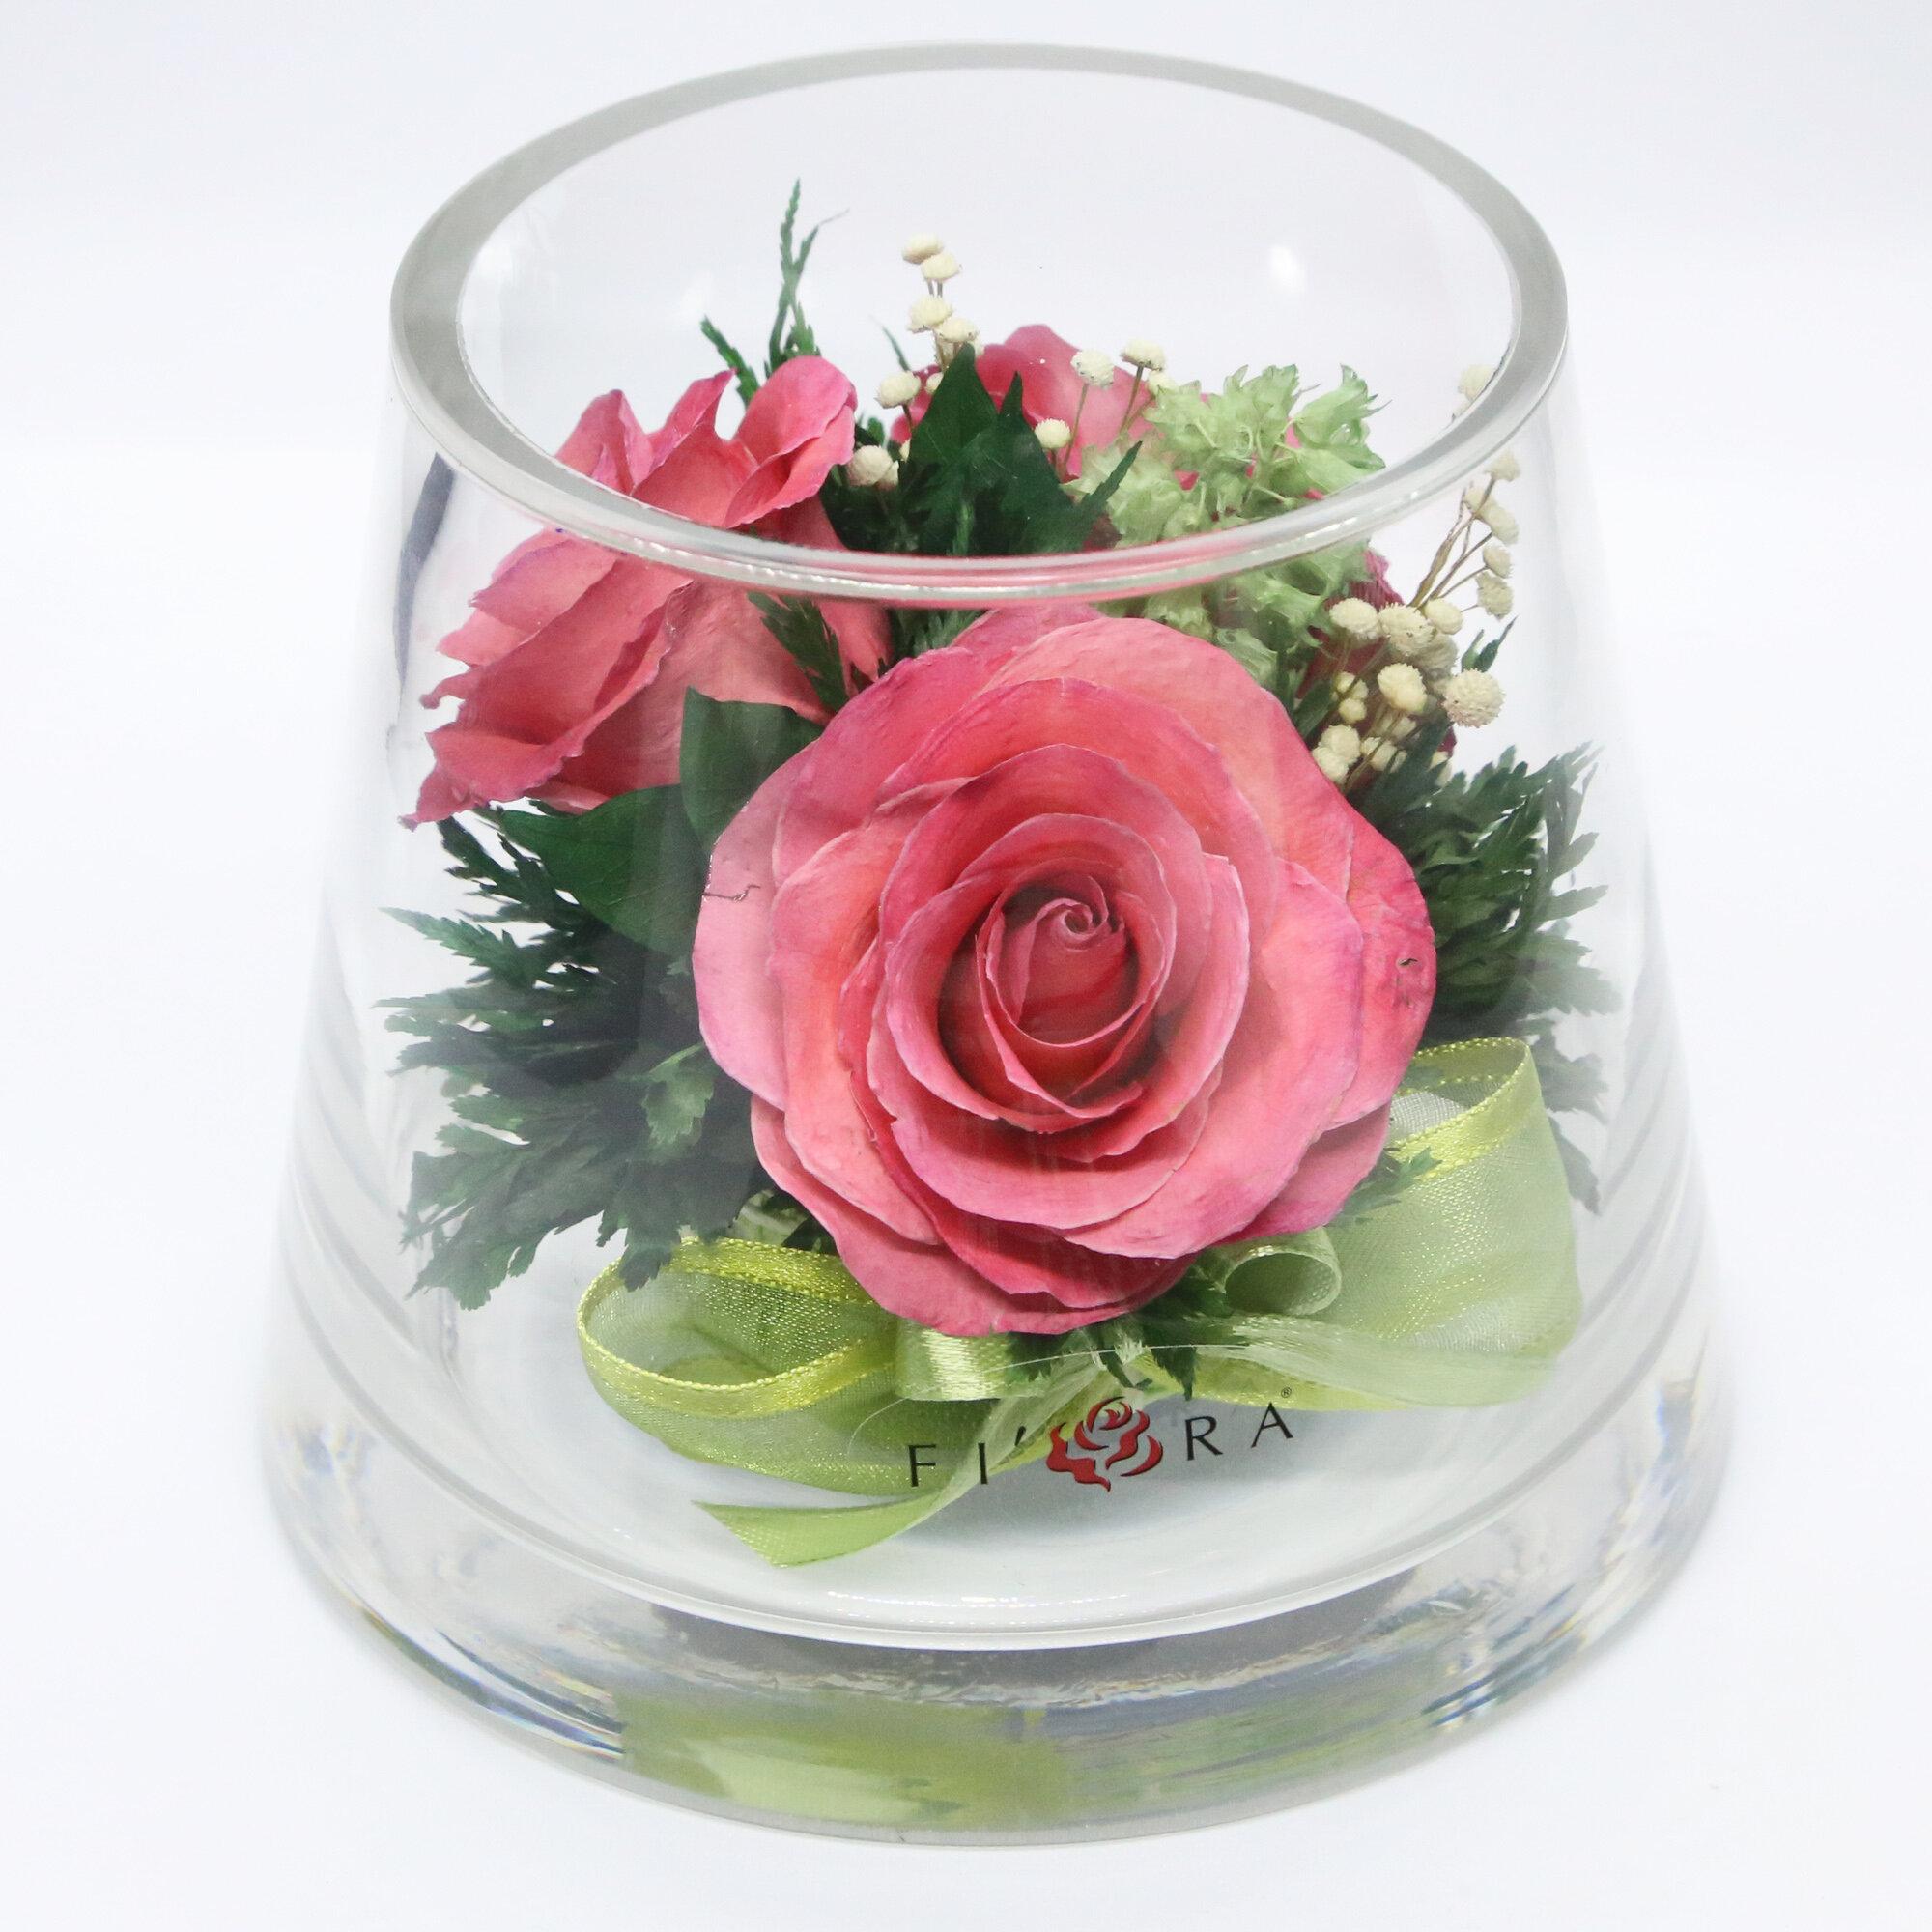 Charlton Home Roses Floral Arrangements And Centerpiece In Decorative Vase Wayfair